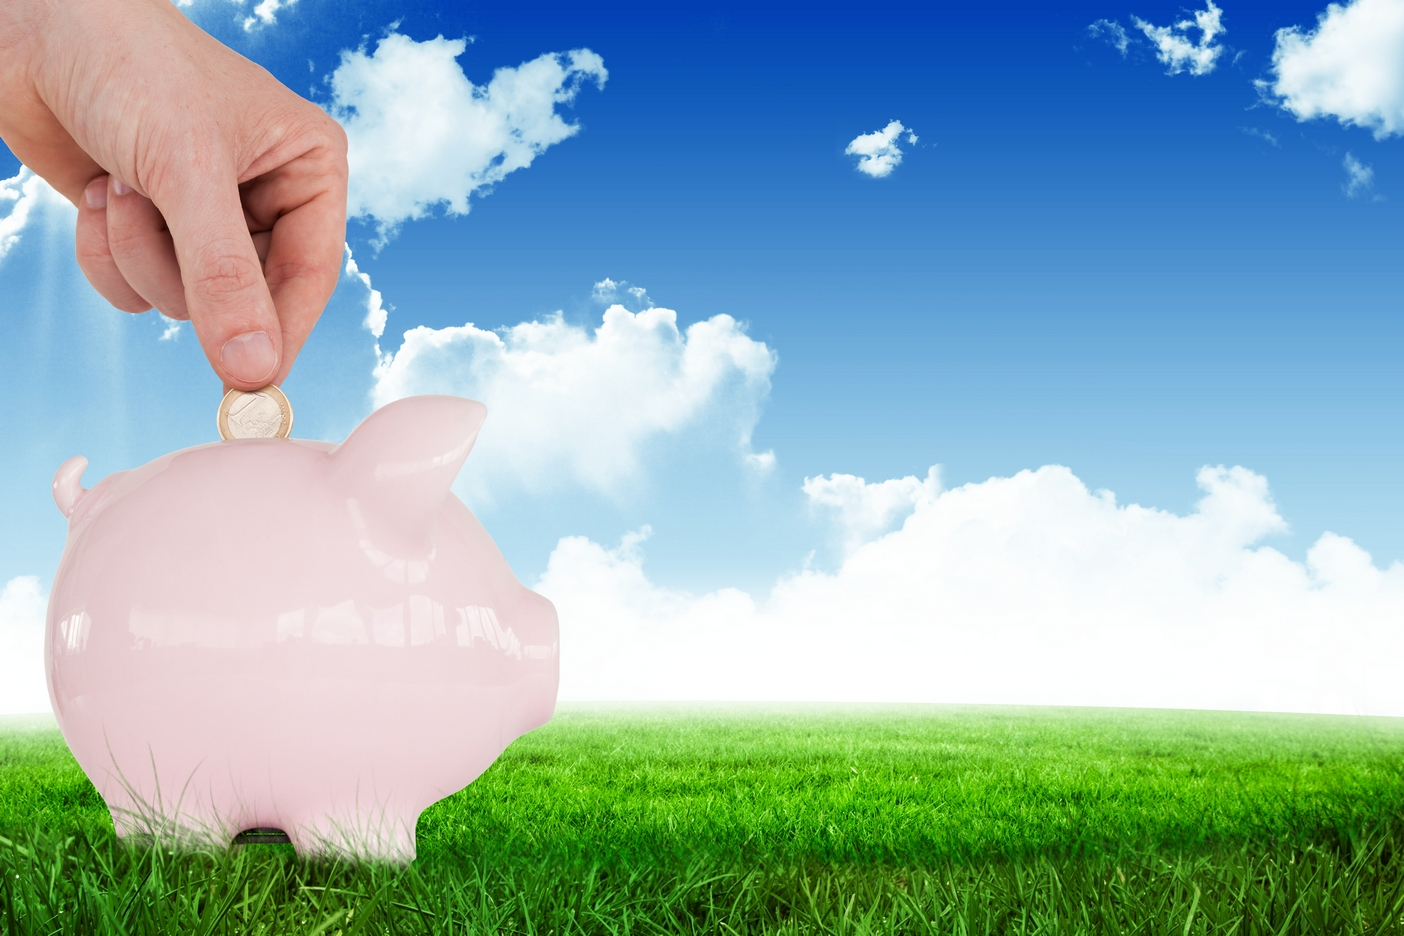 digital com3 kluczowe zasady inwestowaniaposite of hand putting euro in piggy bank